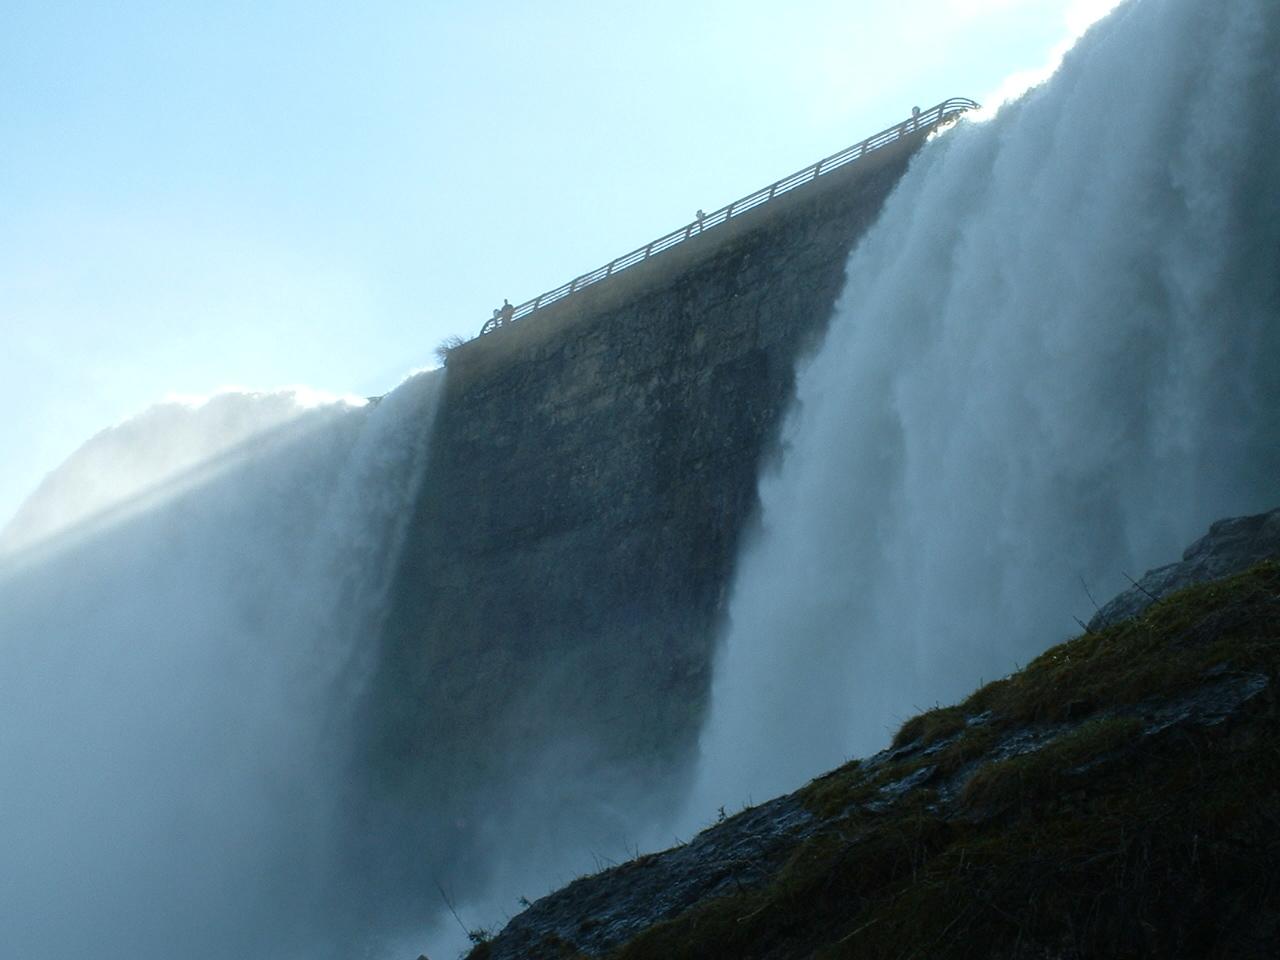 Maid of the mist,Niagara Falls